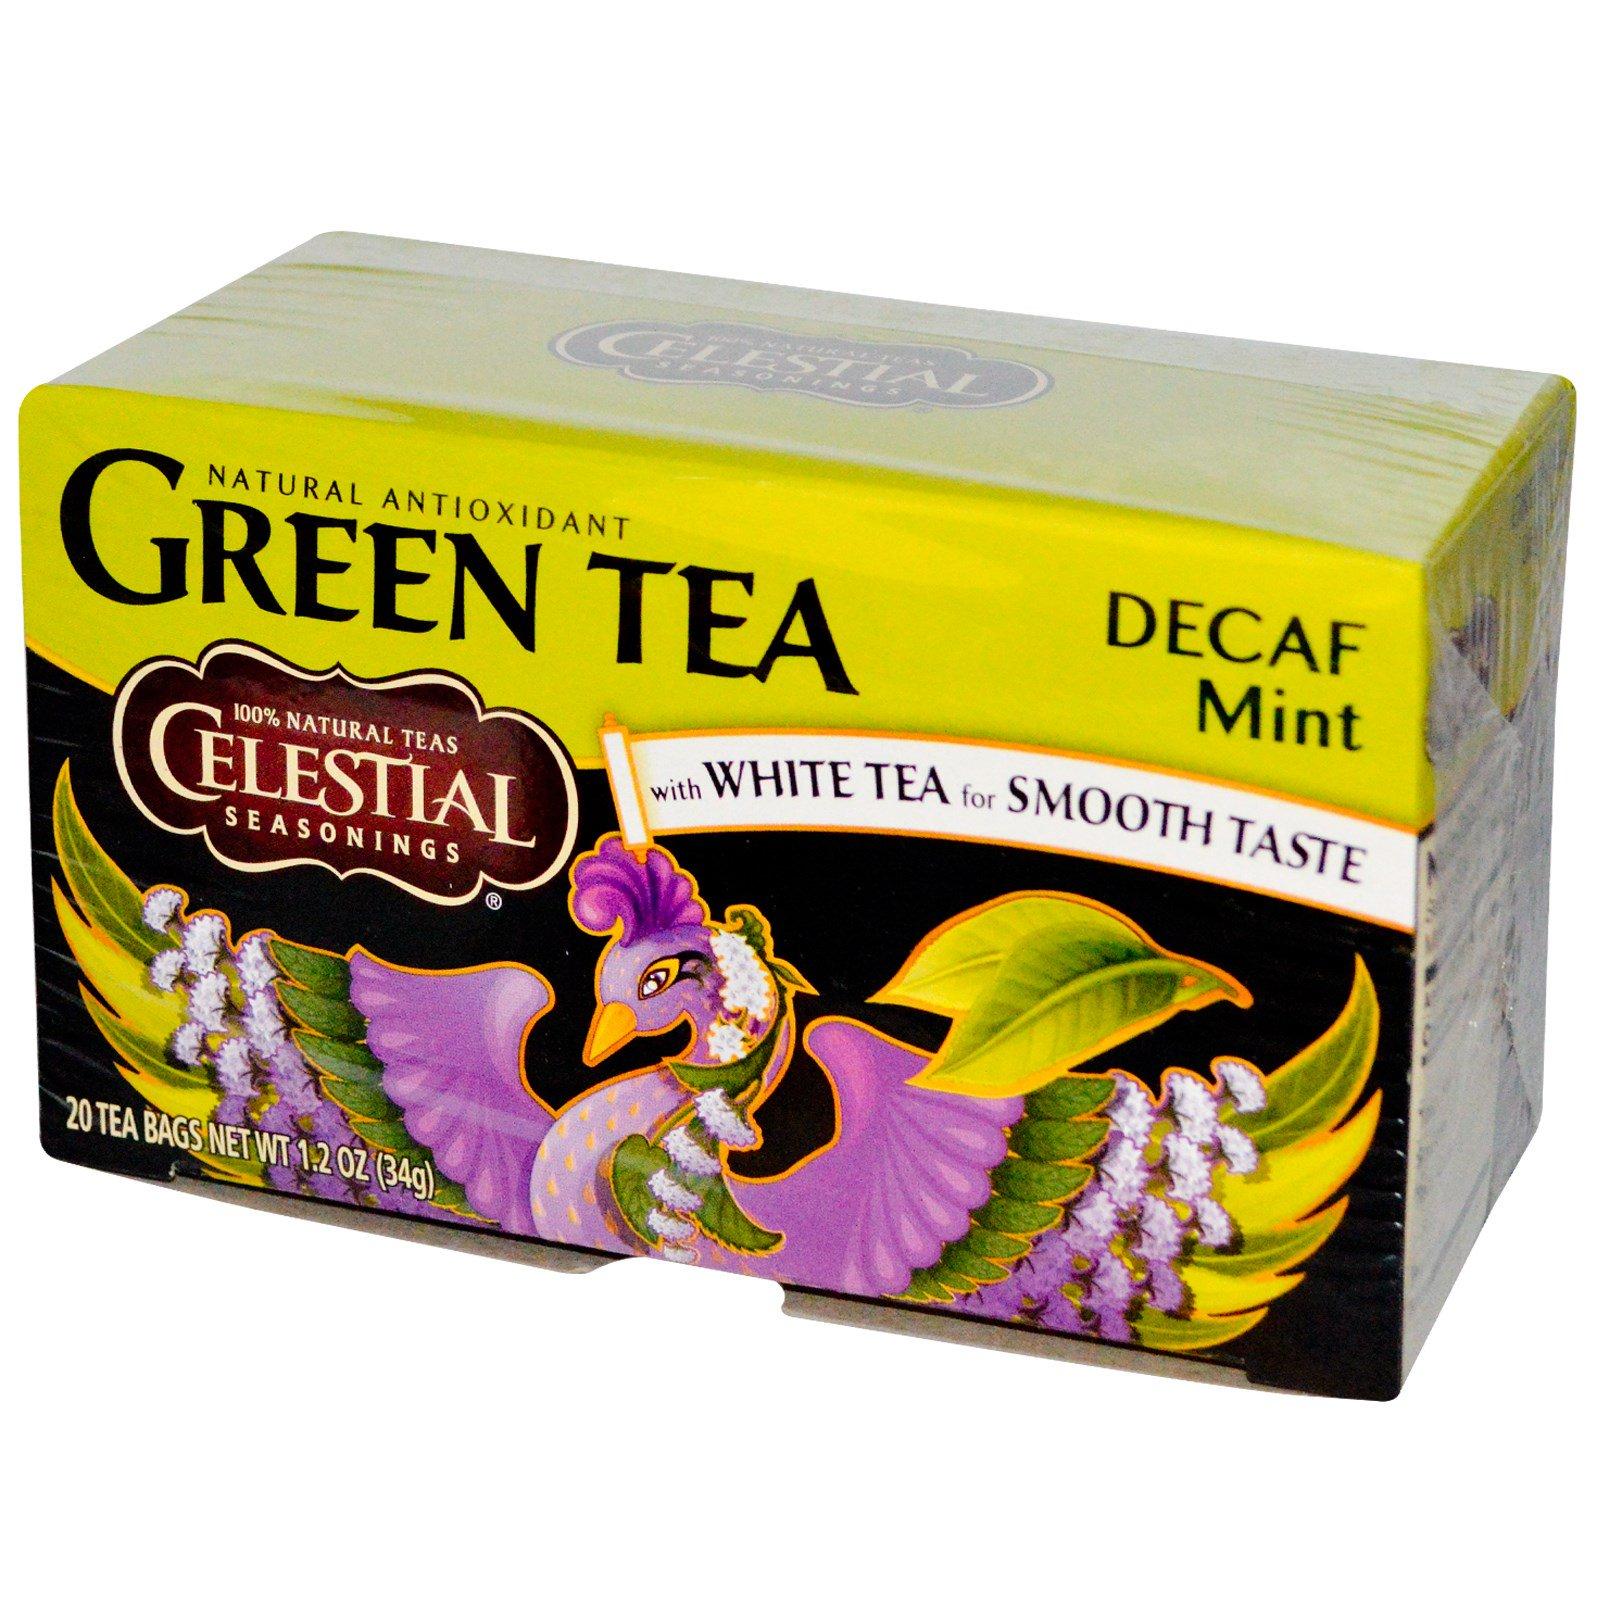 Celestial Seasonings Green Tea with White Tea Decaf Mint 20 Tea